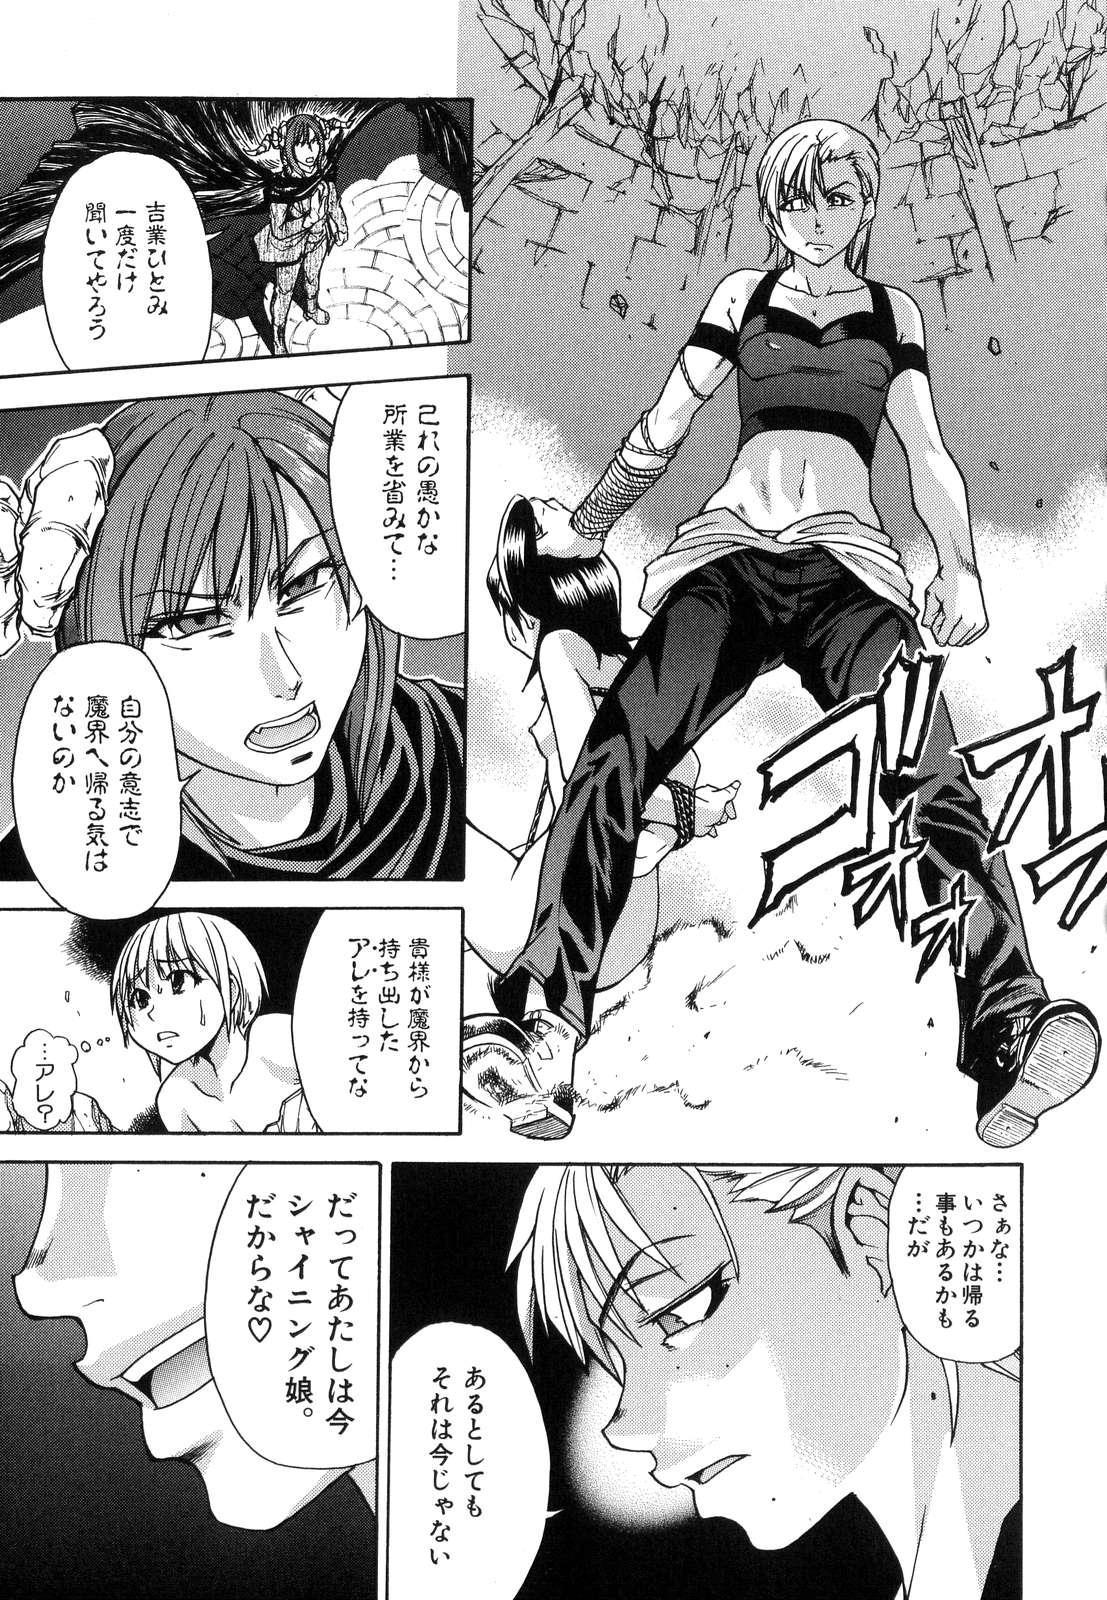 Shining Musume. 6. Rainbow Six 108